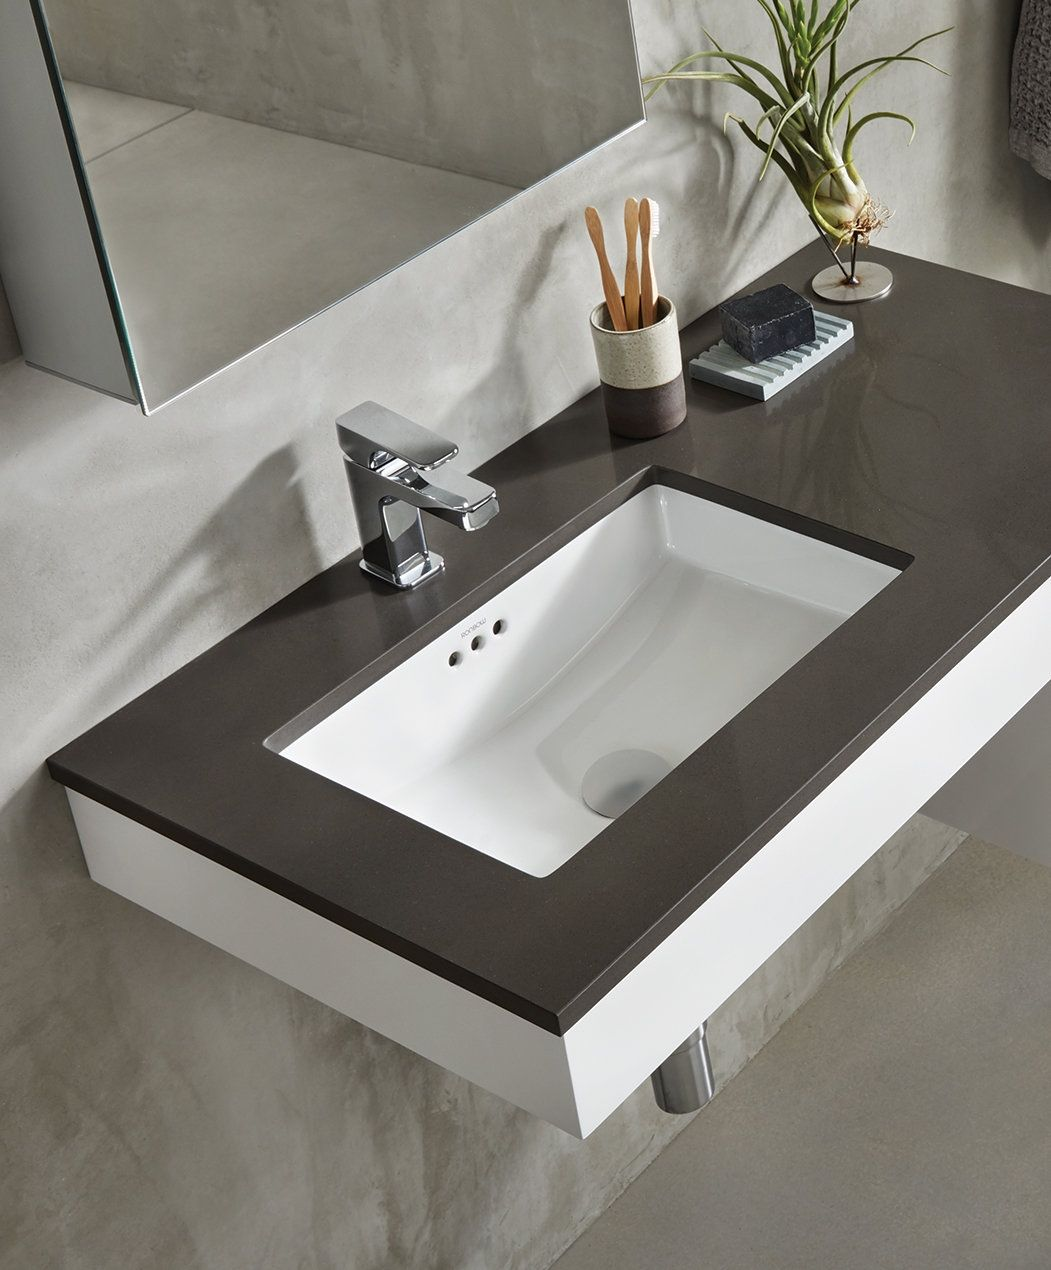 Ronbow Essence Ceramic Rectangular Undermount Bathroom Sink With